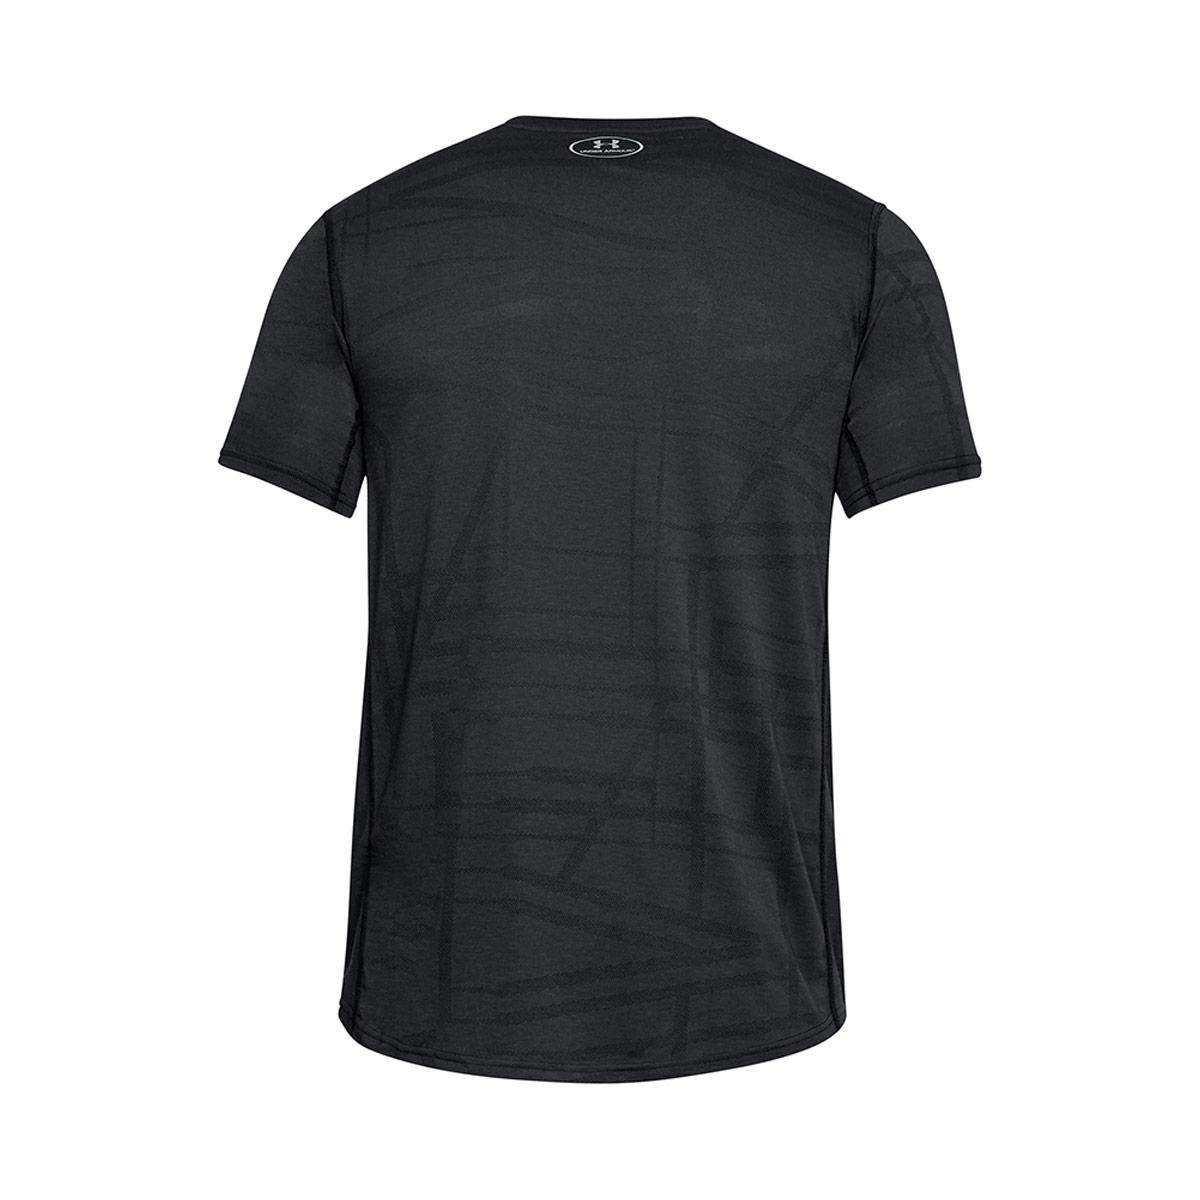 3252b35c57f Mens Black Under Armour Threadborne Elite Tee Shirt   rugbystore